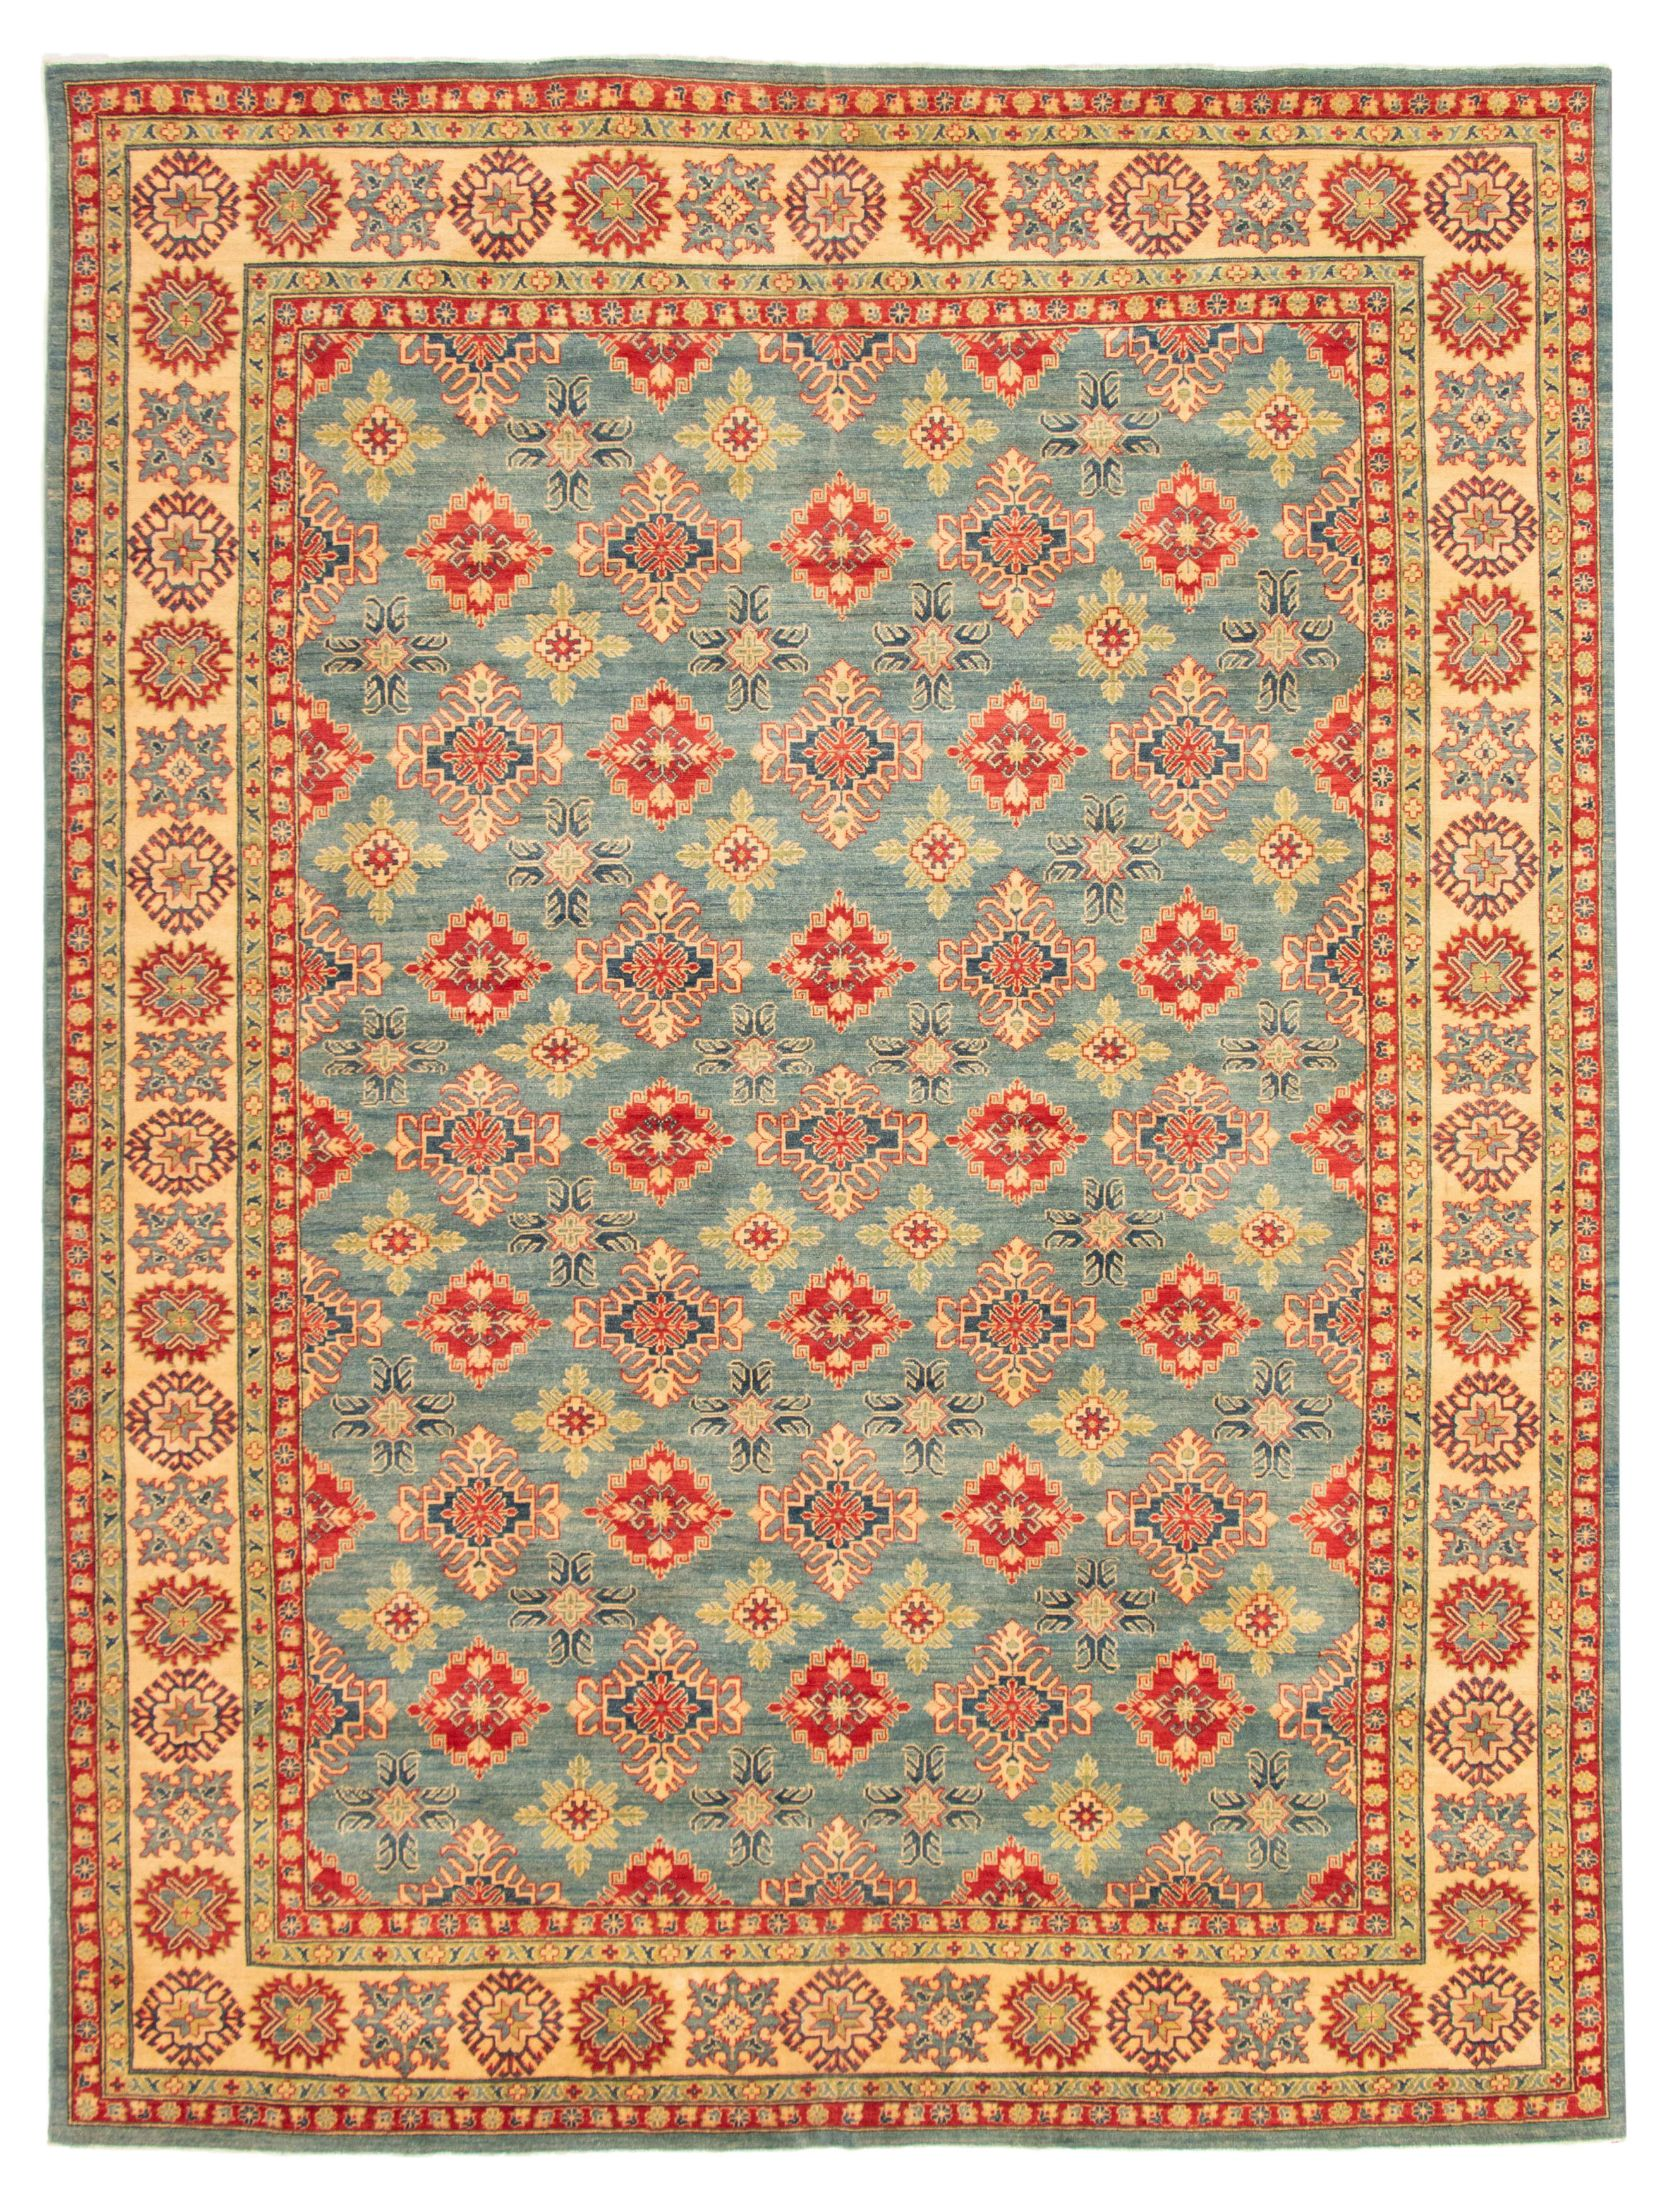 "Hand-knotted Finest Gazni Sky Blue Wool Rug 9'8"" x 13'0"" Size: 9'8"" x 13'0"""